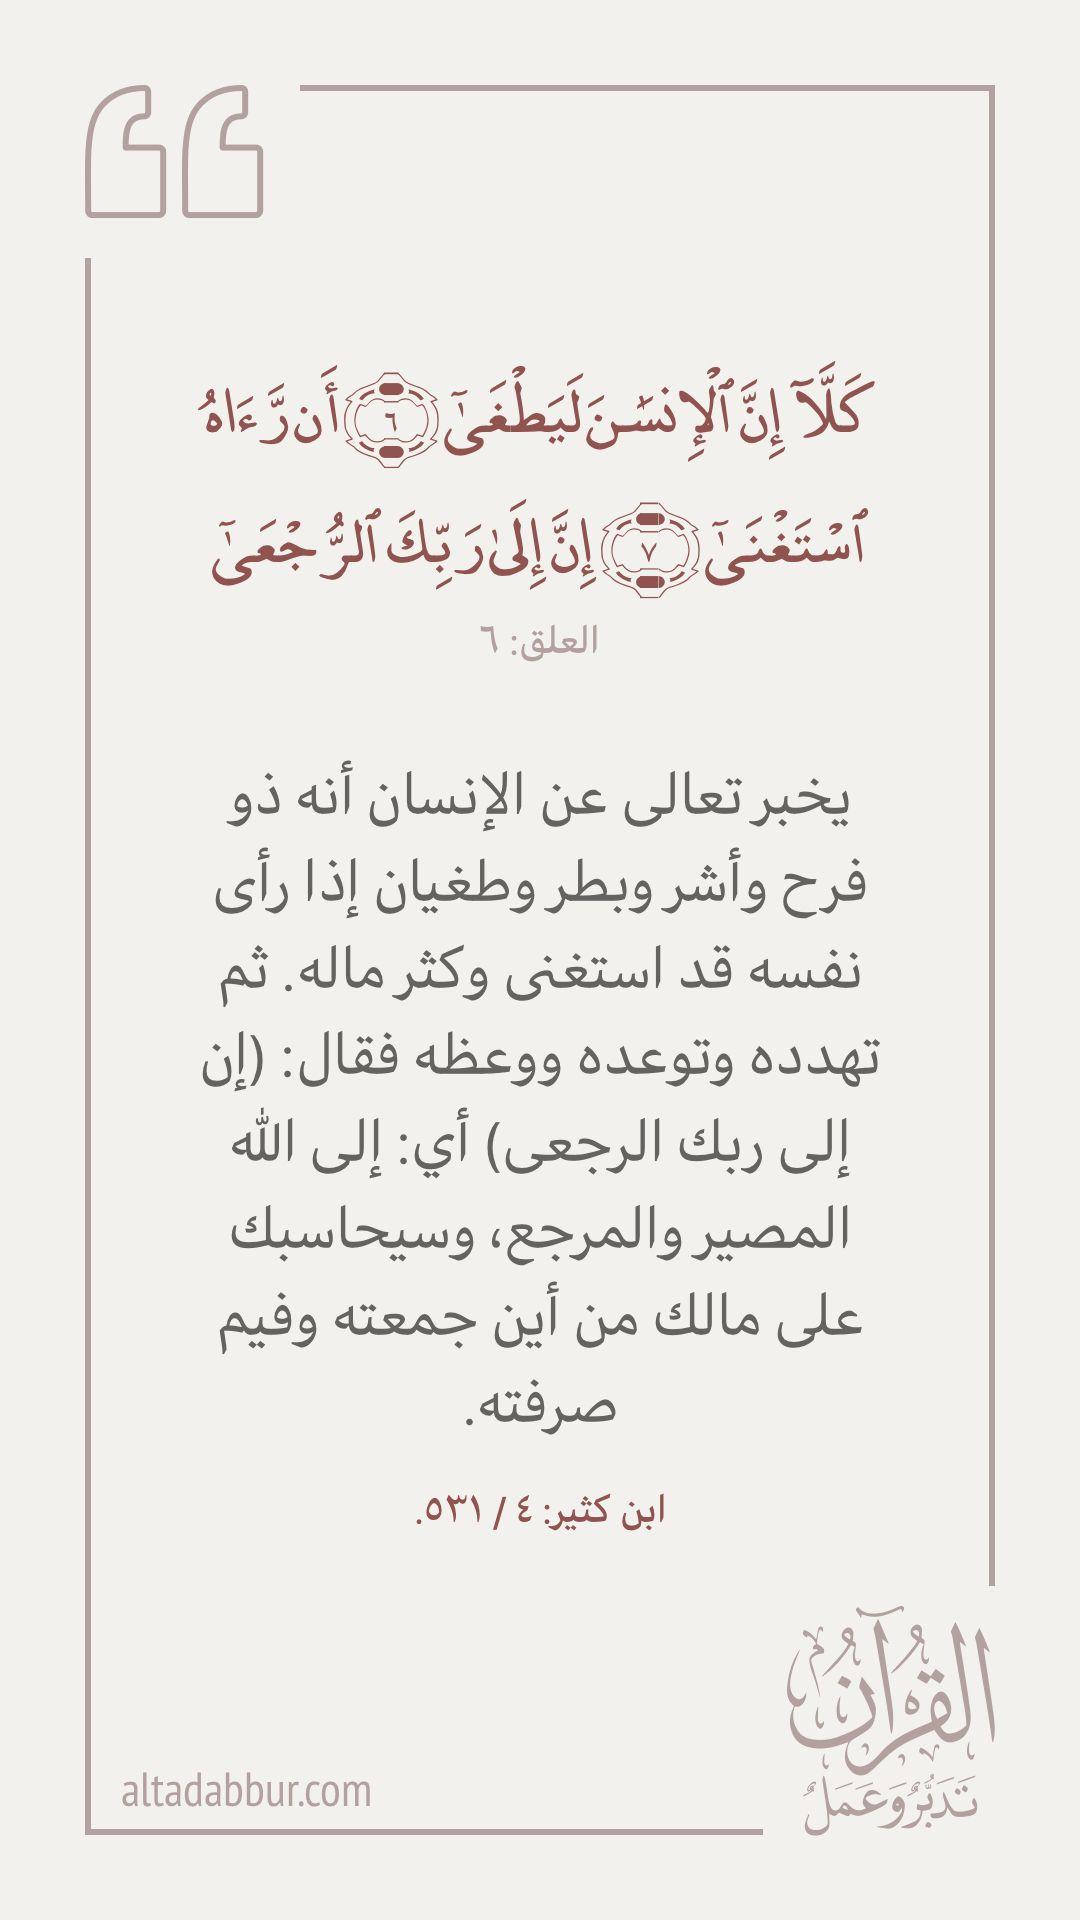 Pin By Amal Mahz12 On قرآن تفسير وتدب ر Badass Quotes Quotes Hadith Quotes